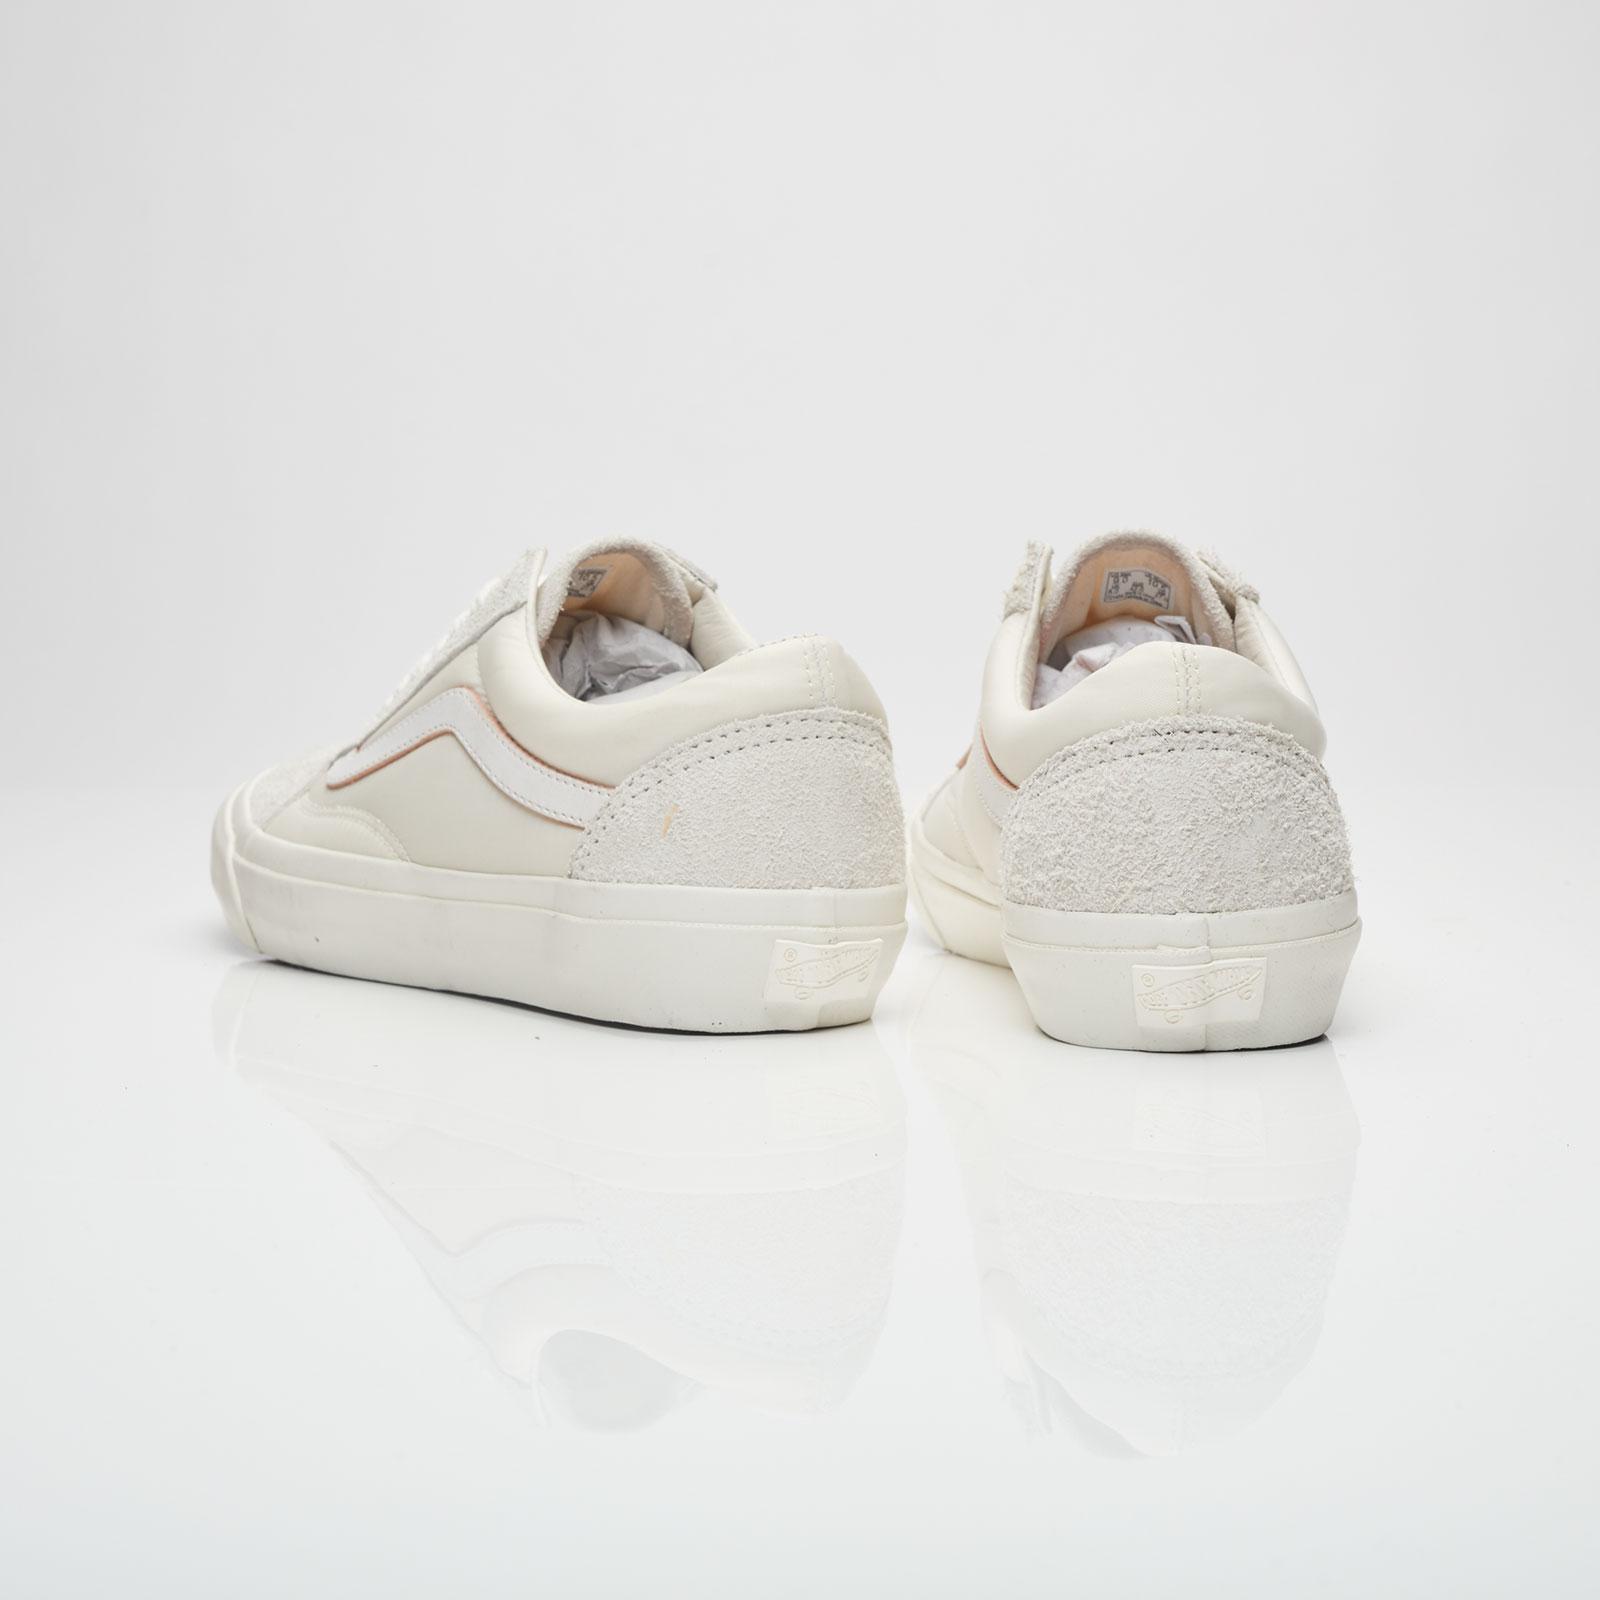 e9fc295188 Vans Ua Old Skool Pro 92 Lx - Va38g7n8a - Sneakersnstuff